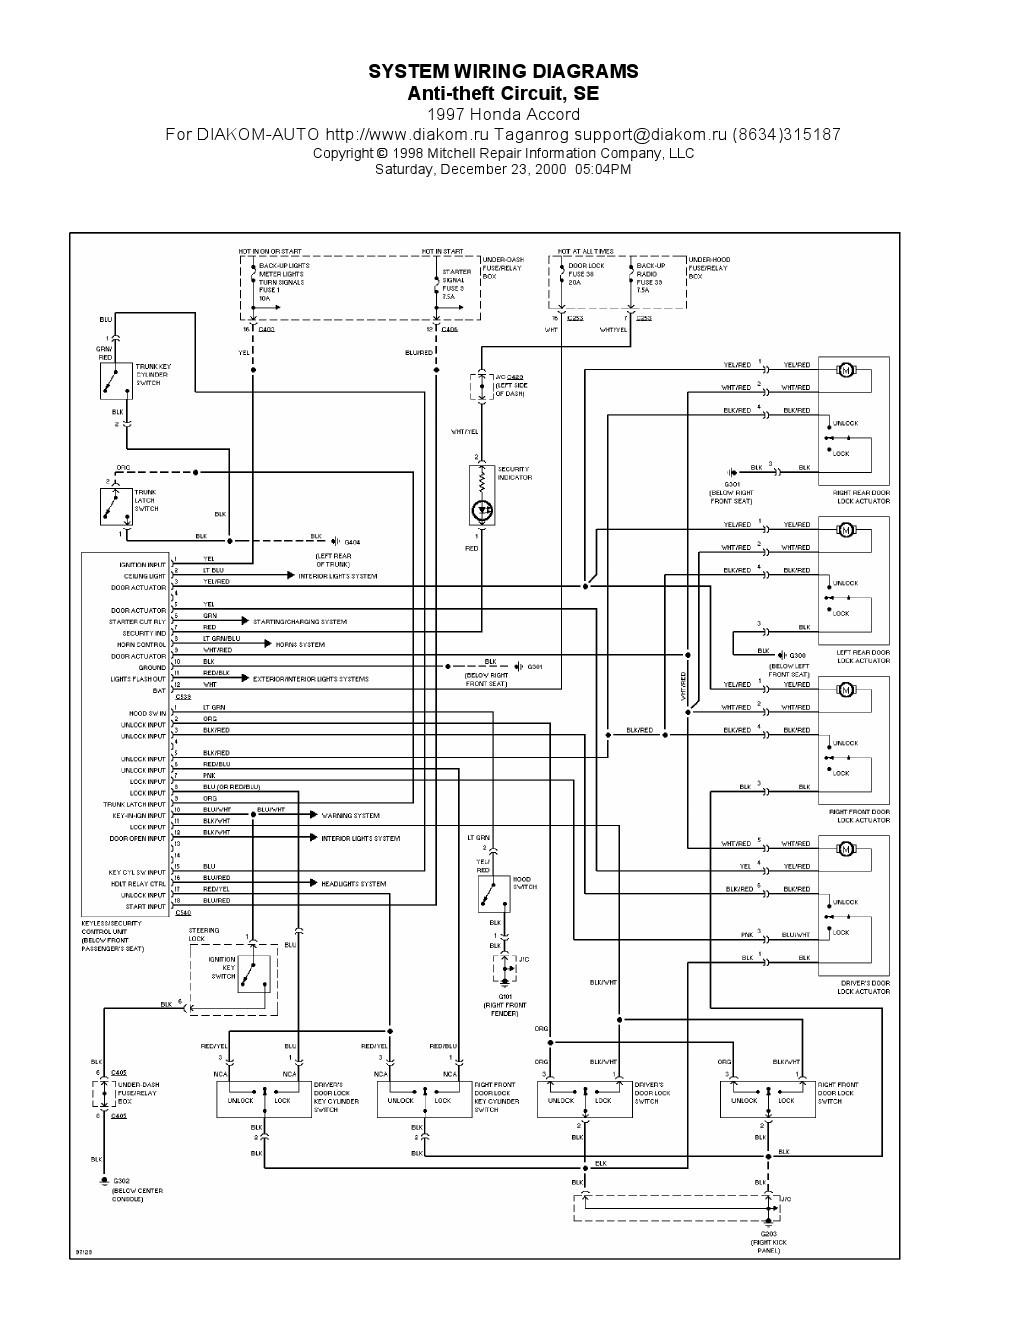 94 Honda Accord Wiring Diagram Vw Ignition Coil Wiring Diagram Viiintage Los Dodol Jeanjaures37 Fr